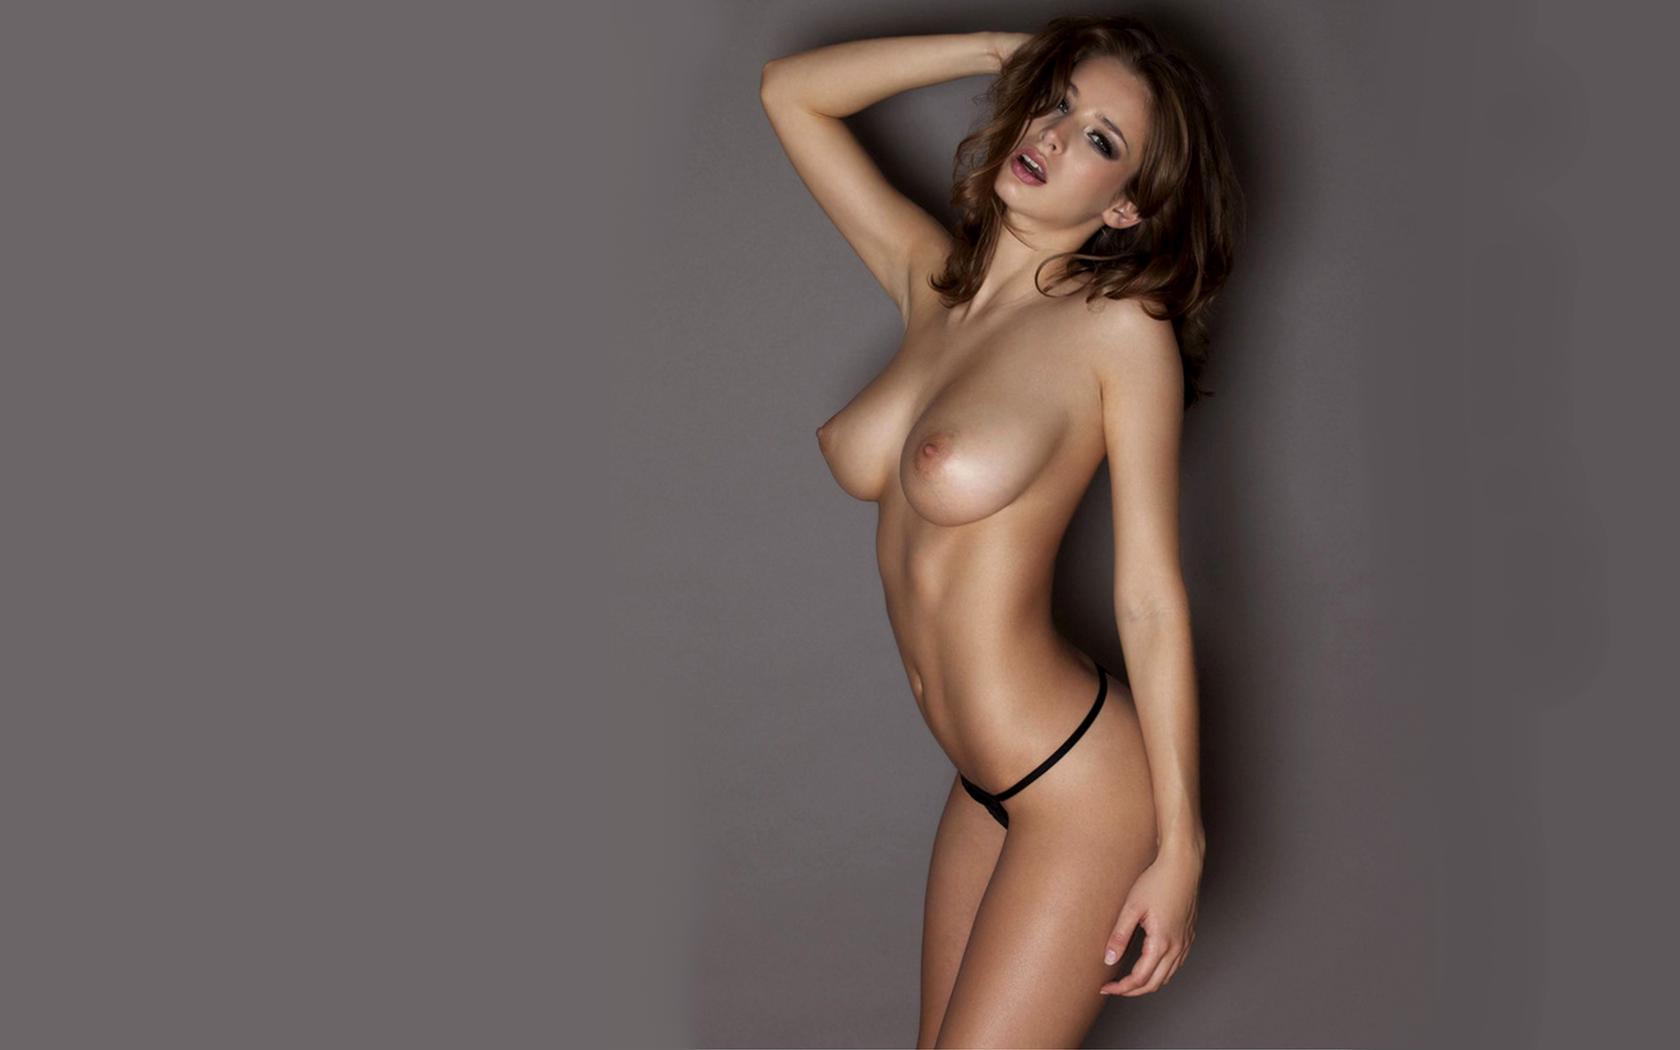 Download photo 1680x1050, erotic, sexy, nude, girls, cute ...